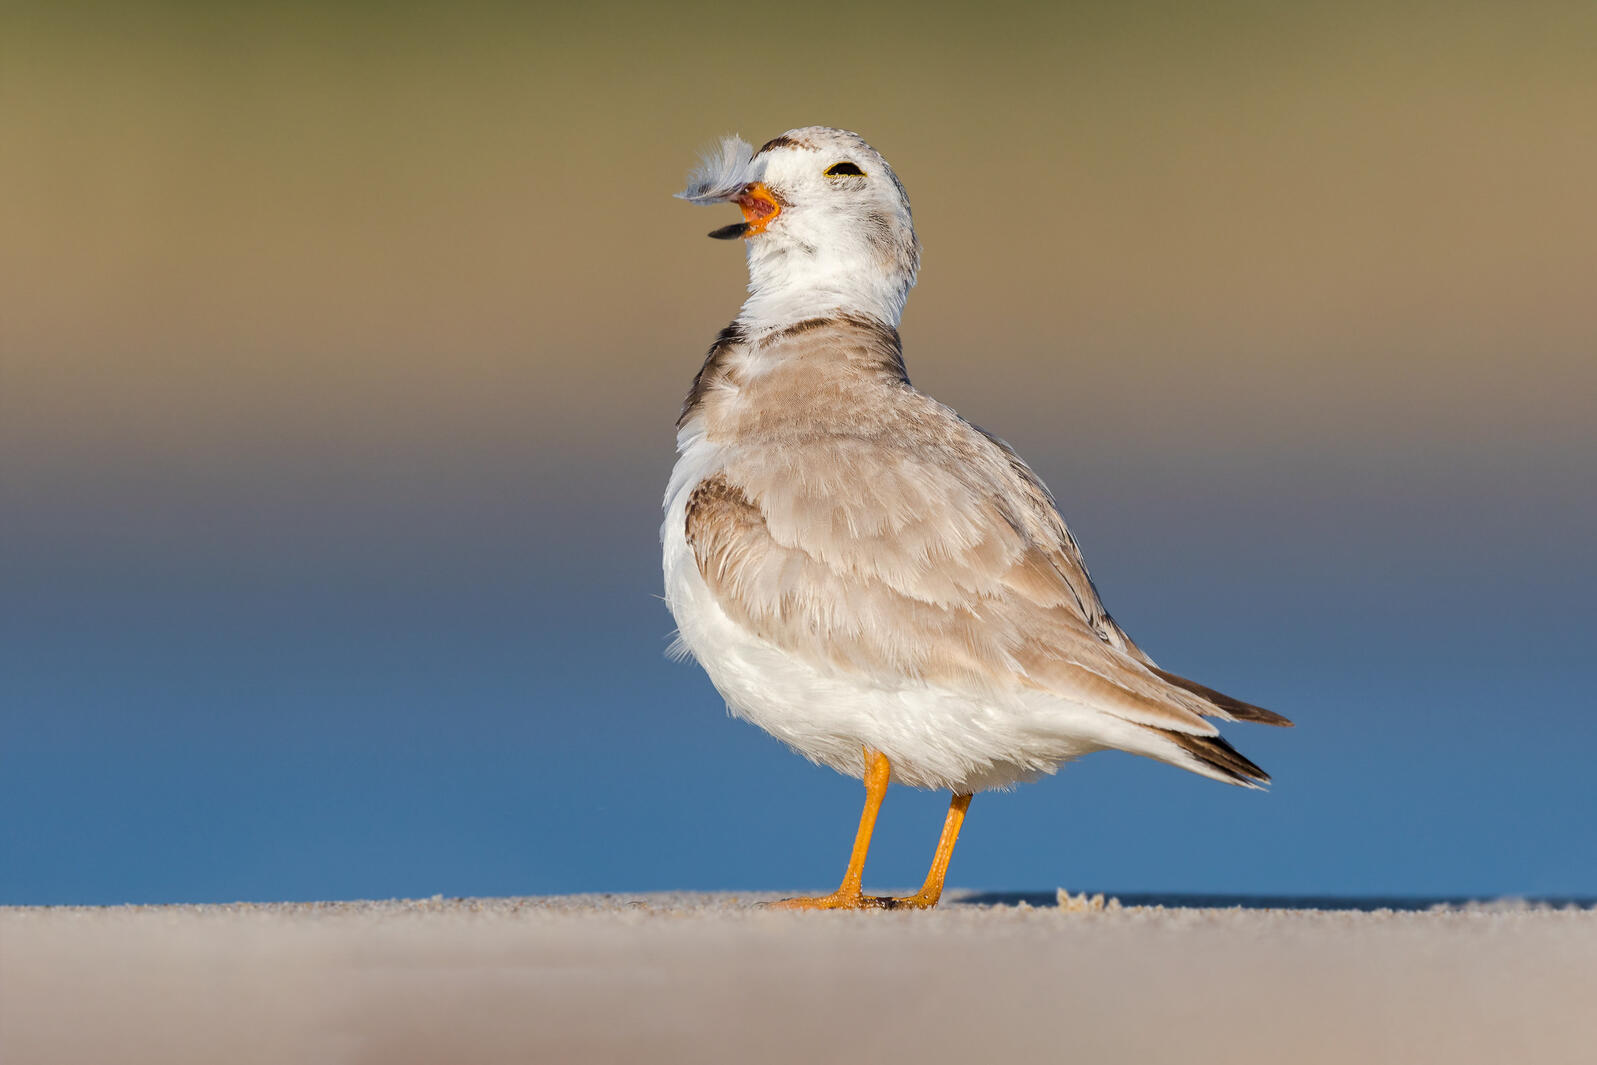 Piping Plover. Matthew Filosa/Audubon Photography Awards